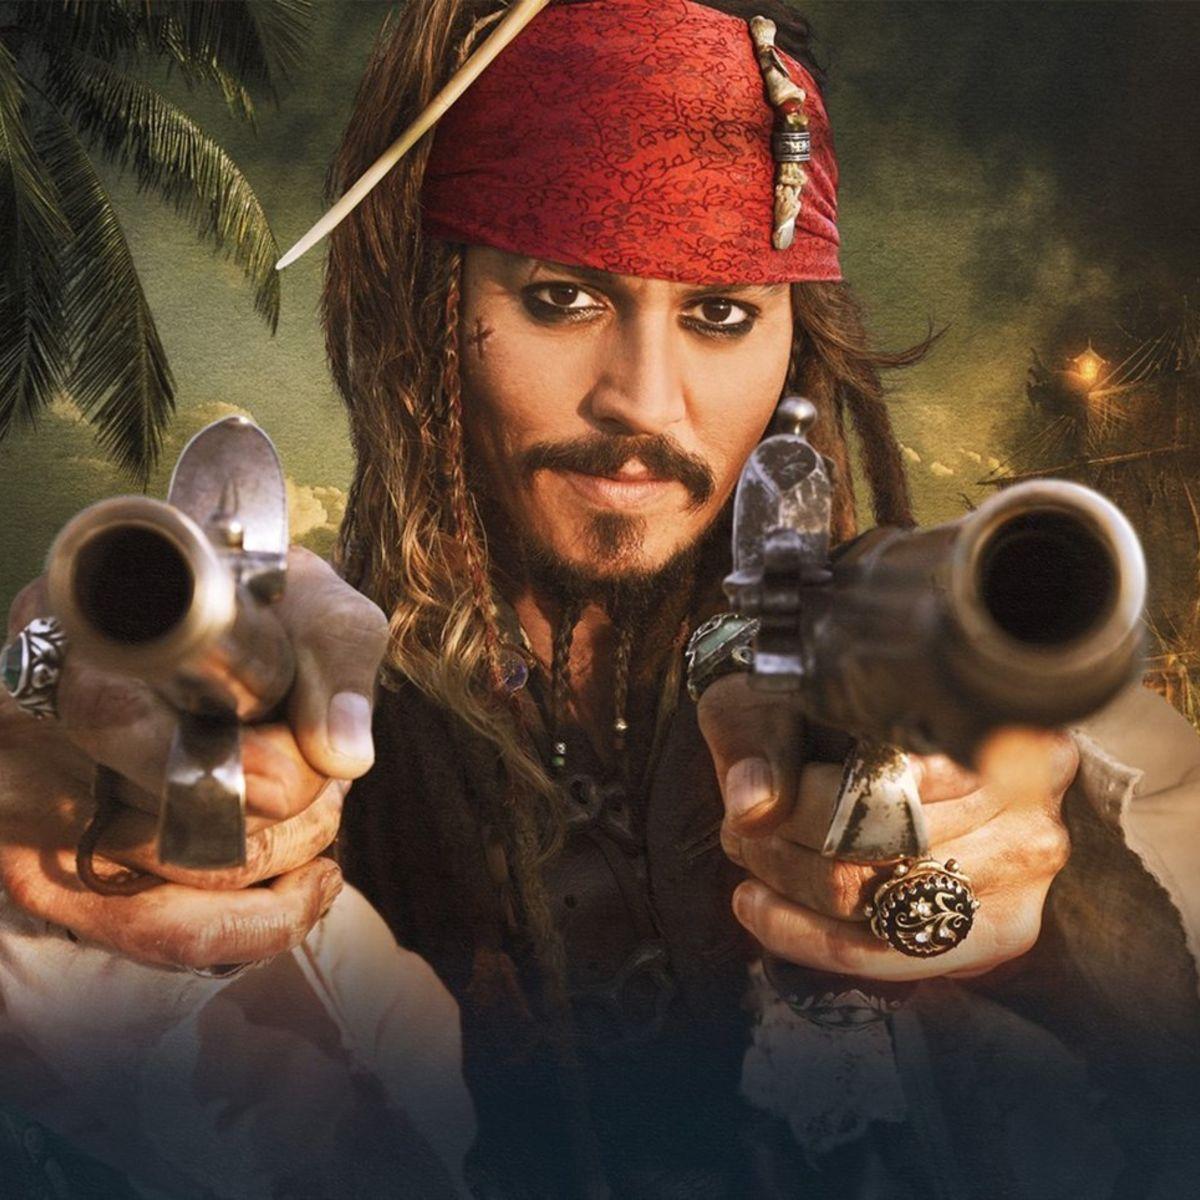 Captain-Jack-Sparrow-pirates-of-the-caribbean-25834698-1408-964.jpg